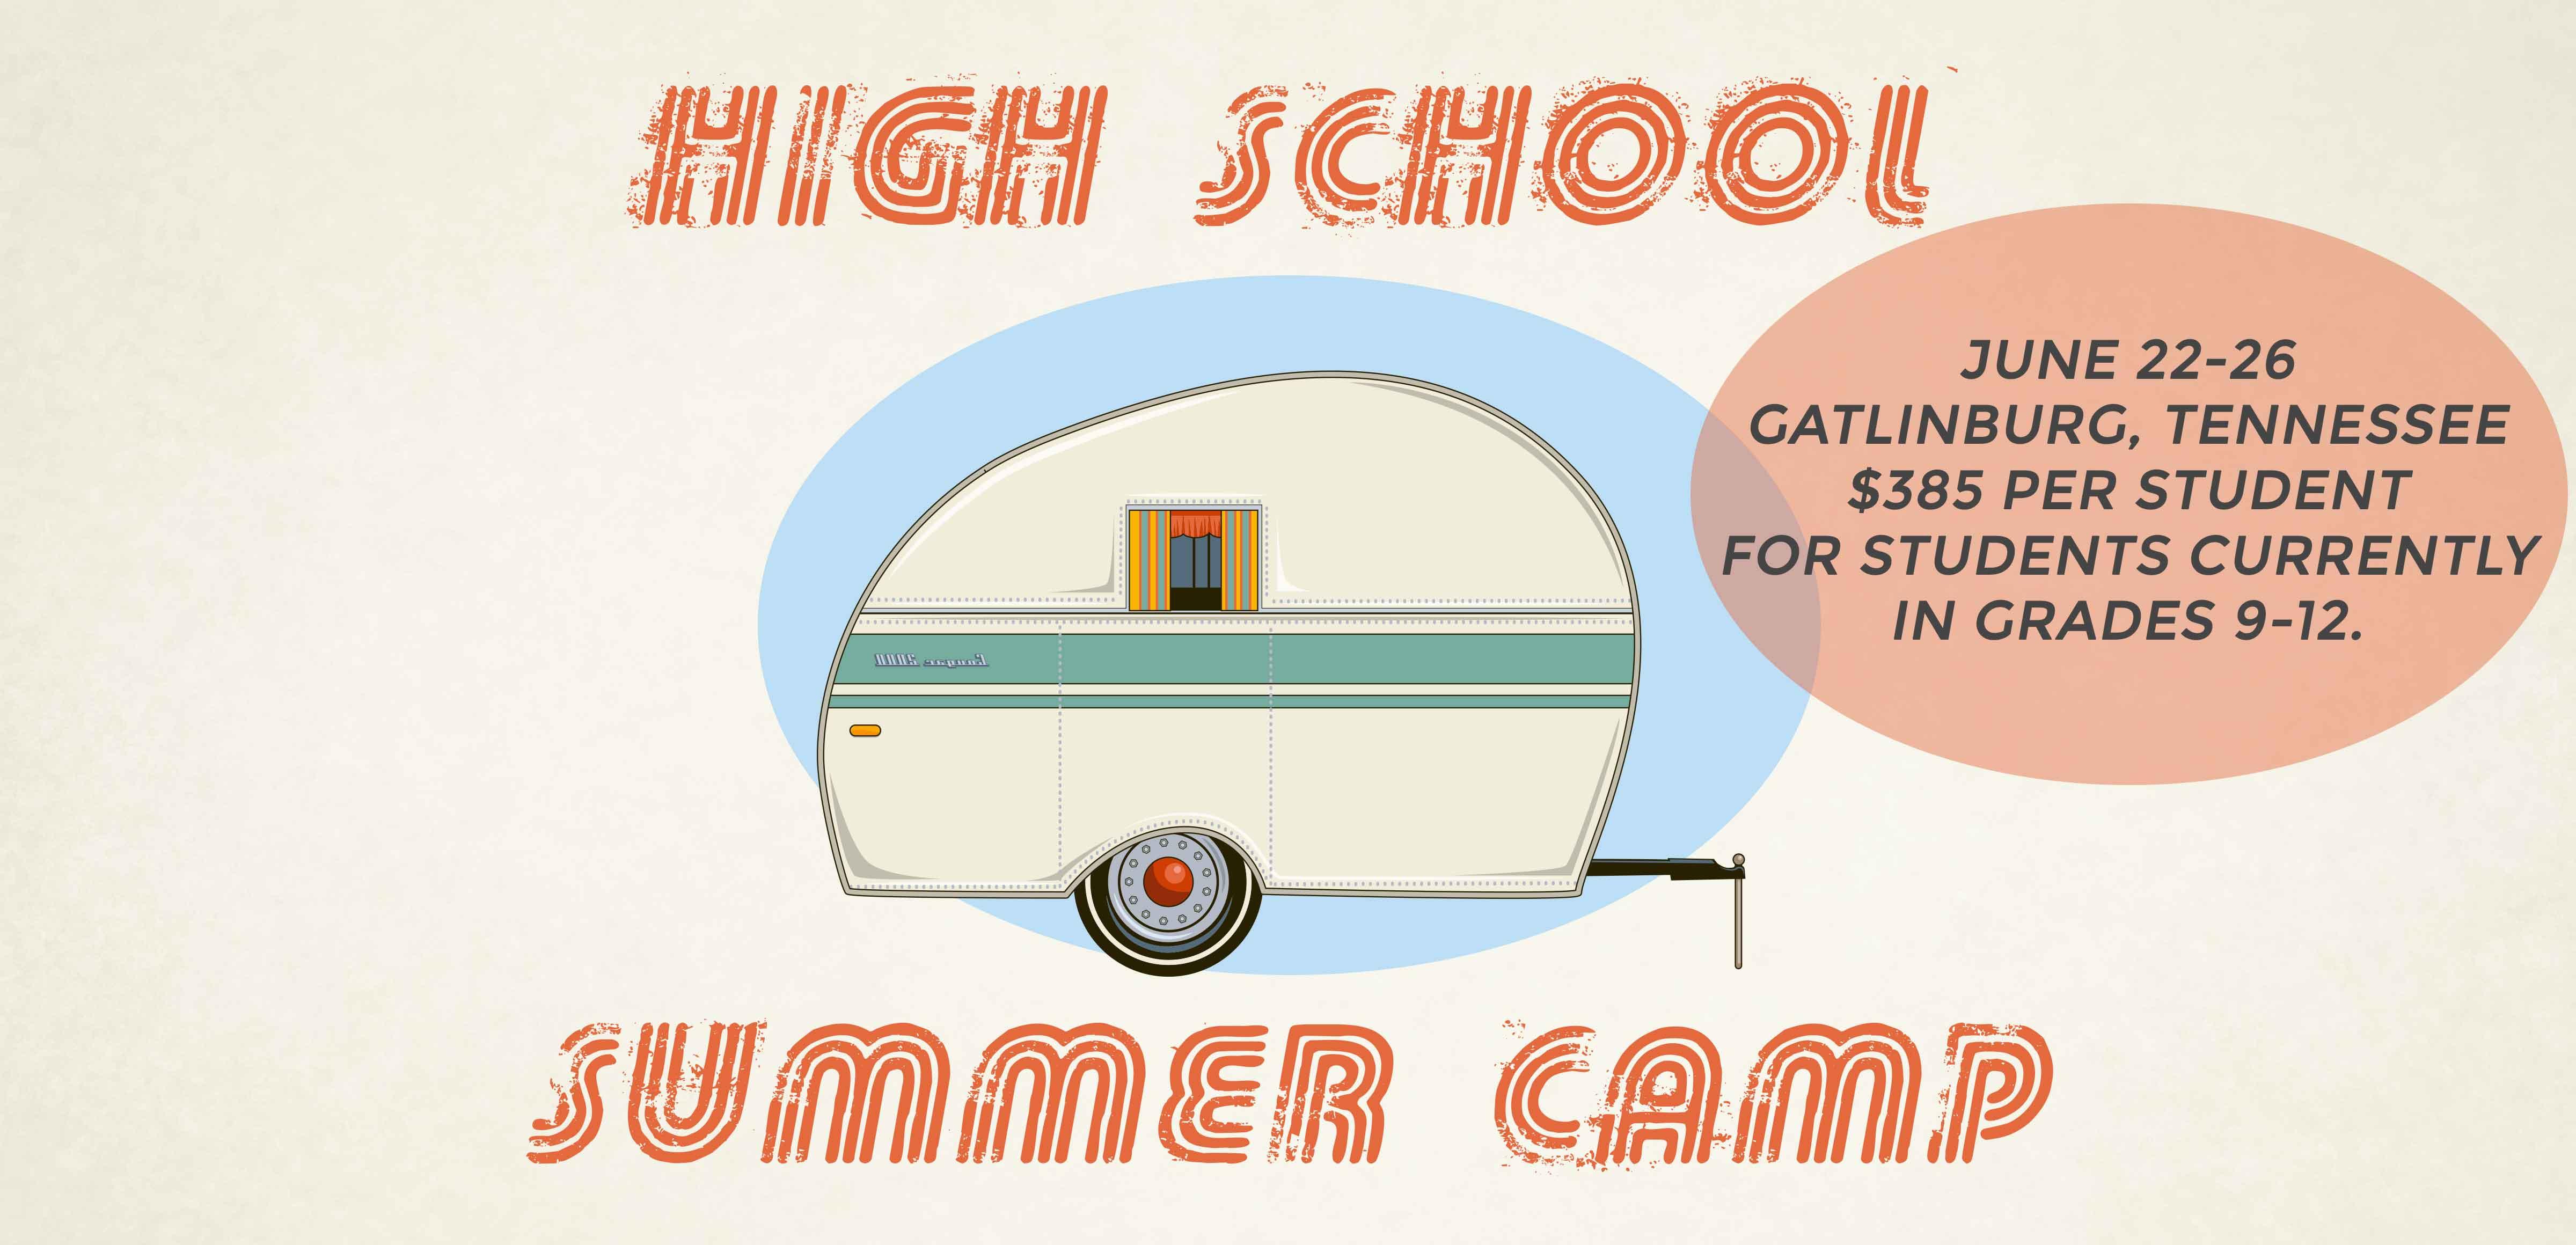 HighSchoolCamp2017PostLarge